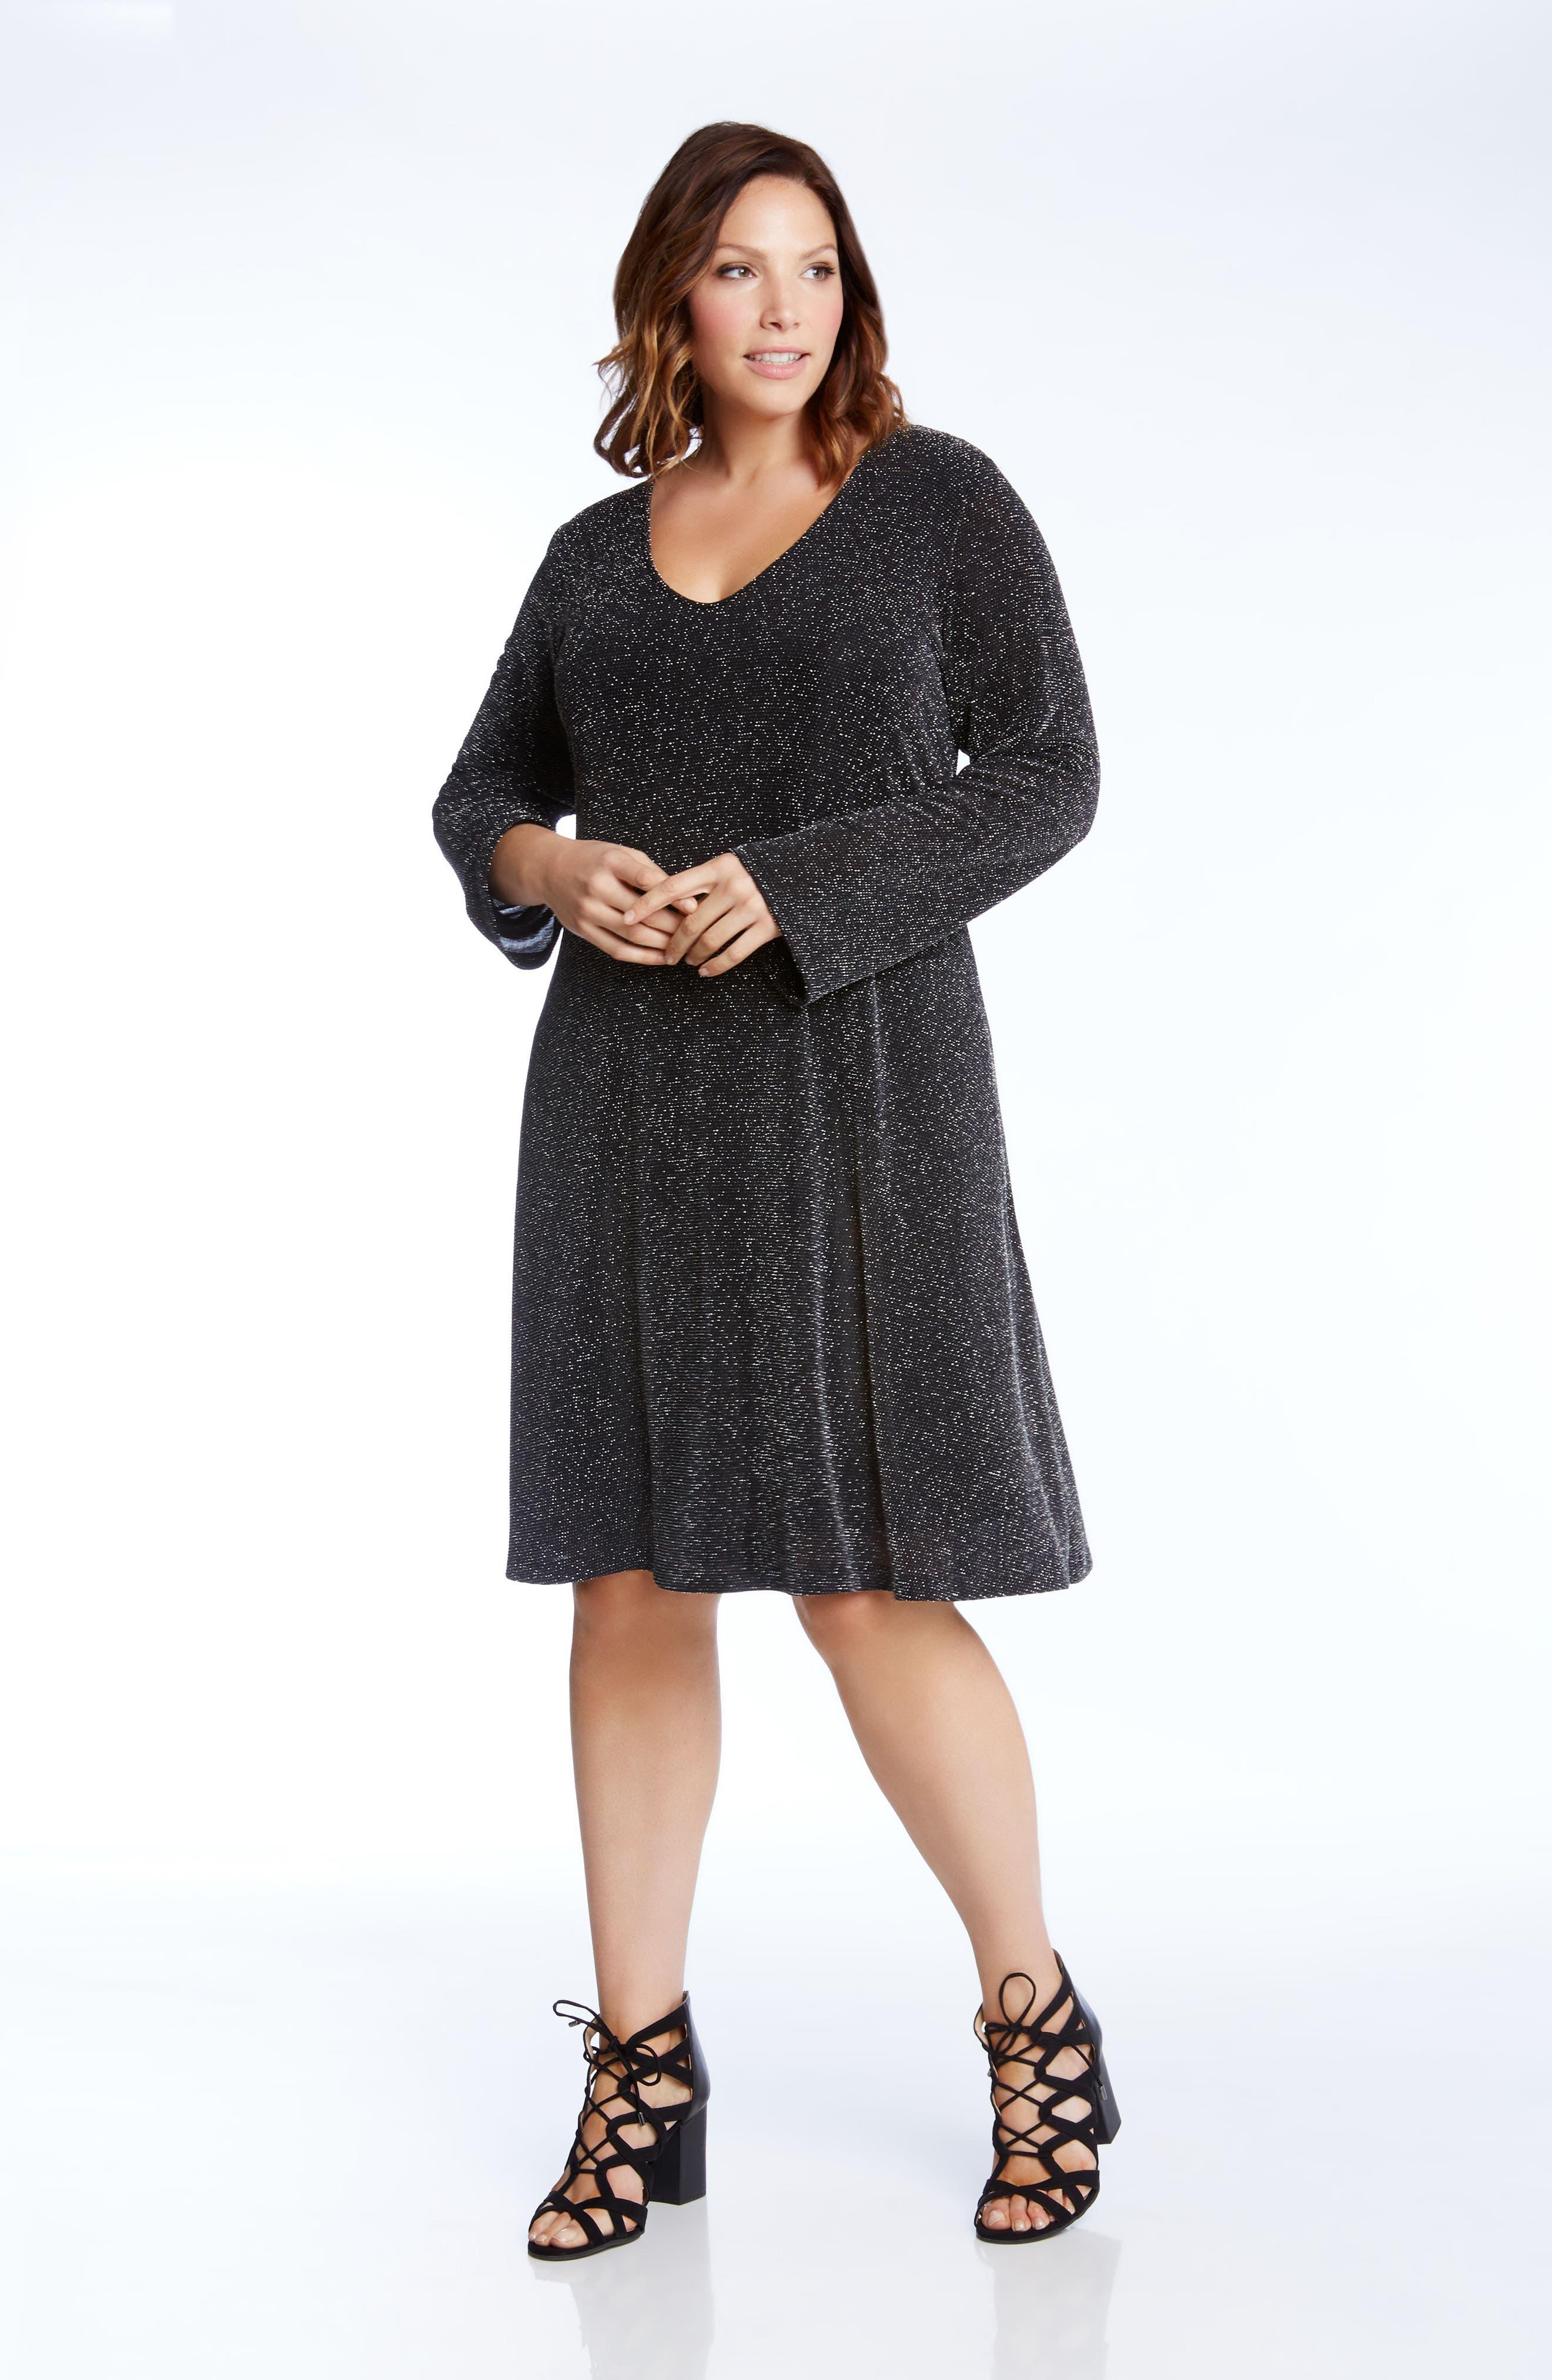 Taylor Sparkle Knit Dress,                             Alternate thumbnail 4, color,                             044